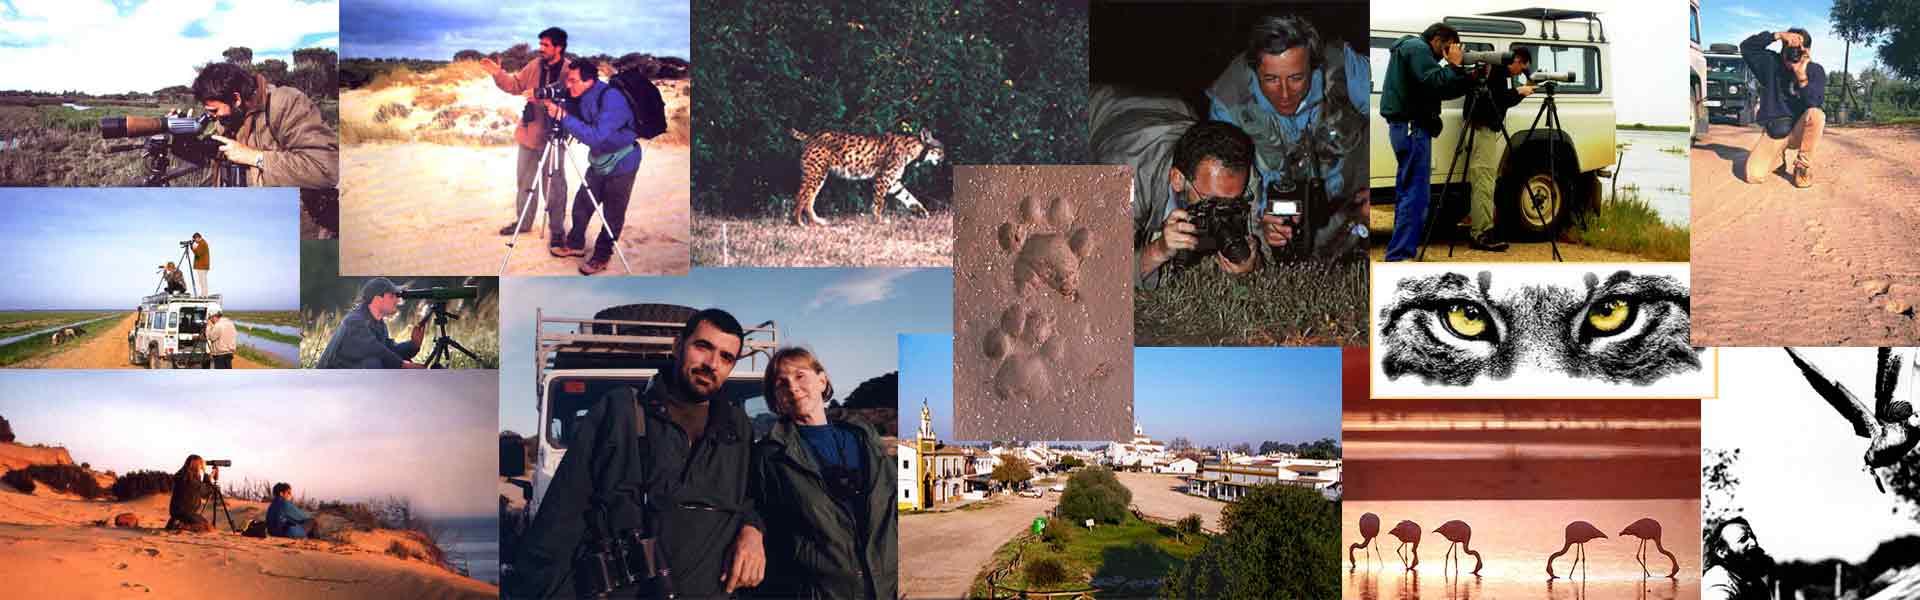 mosaico fotos antiguas